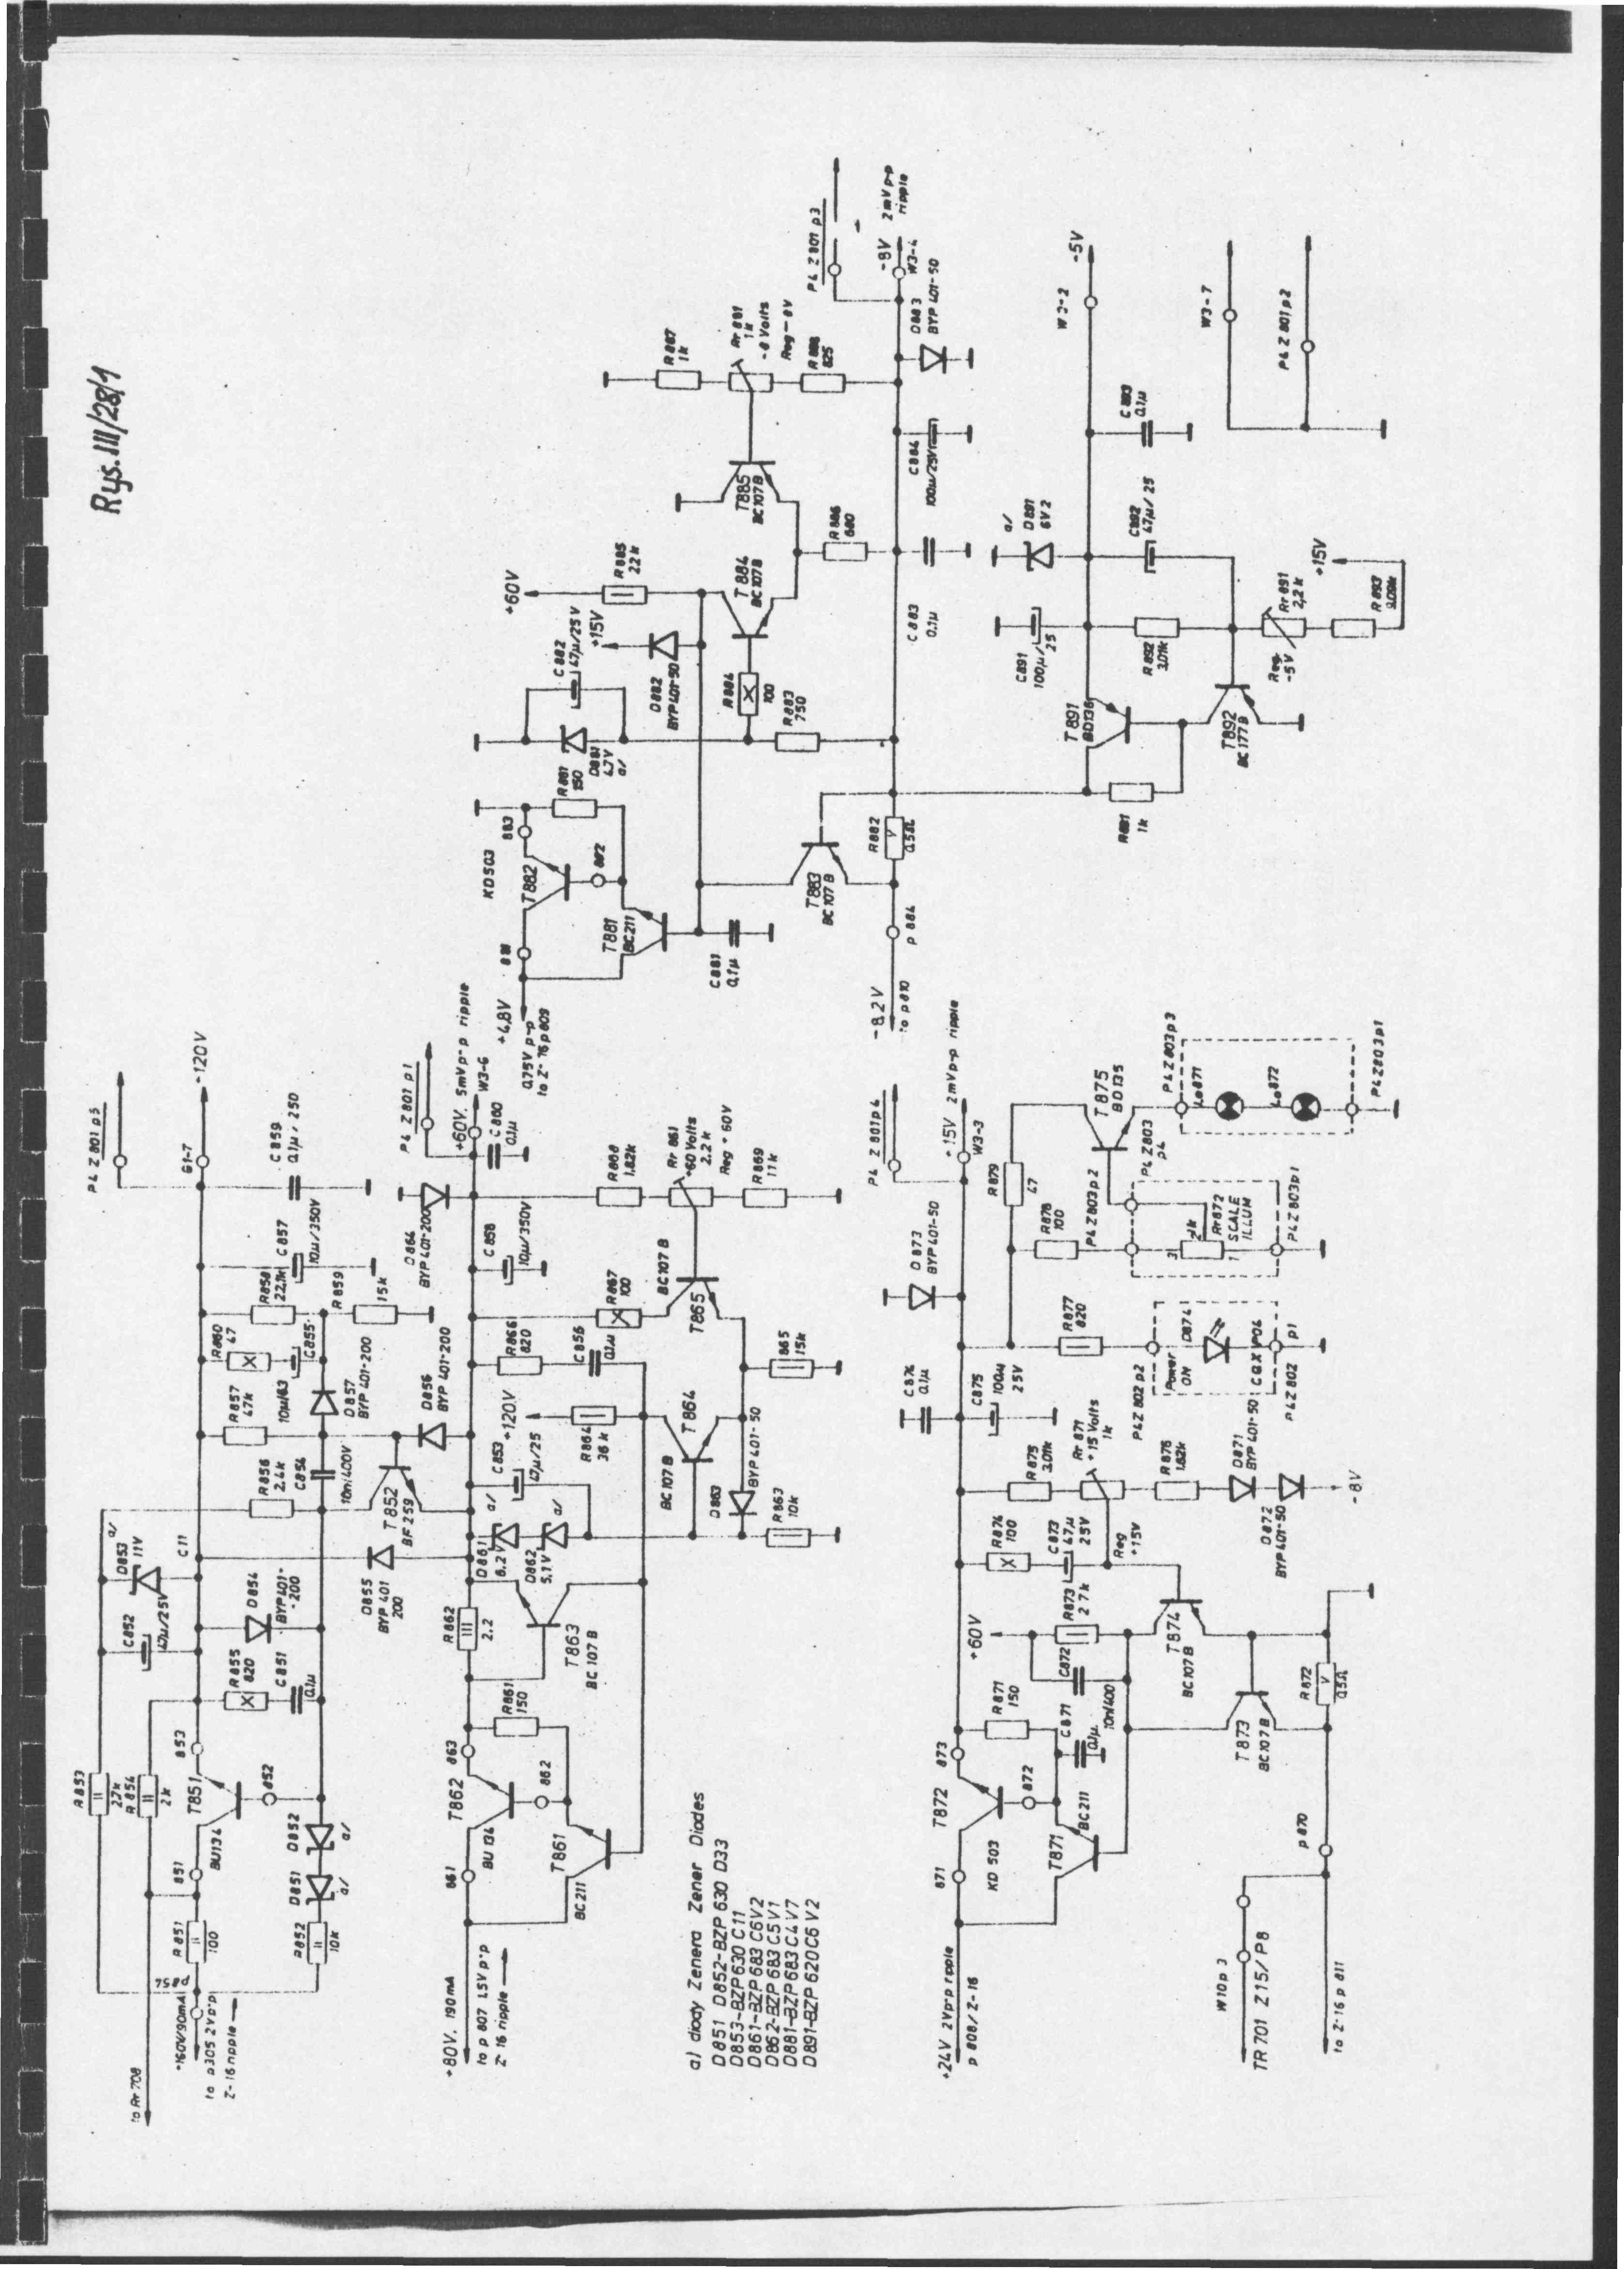 osciloscope dt-6620